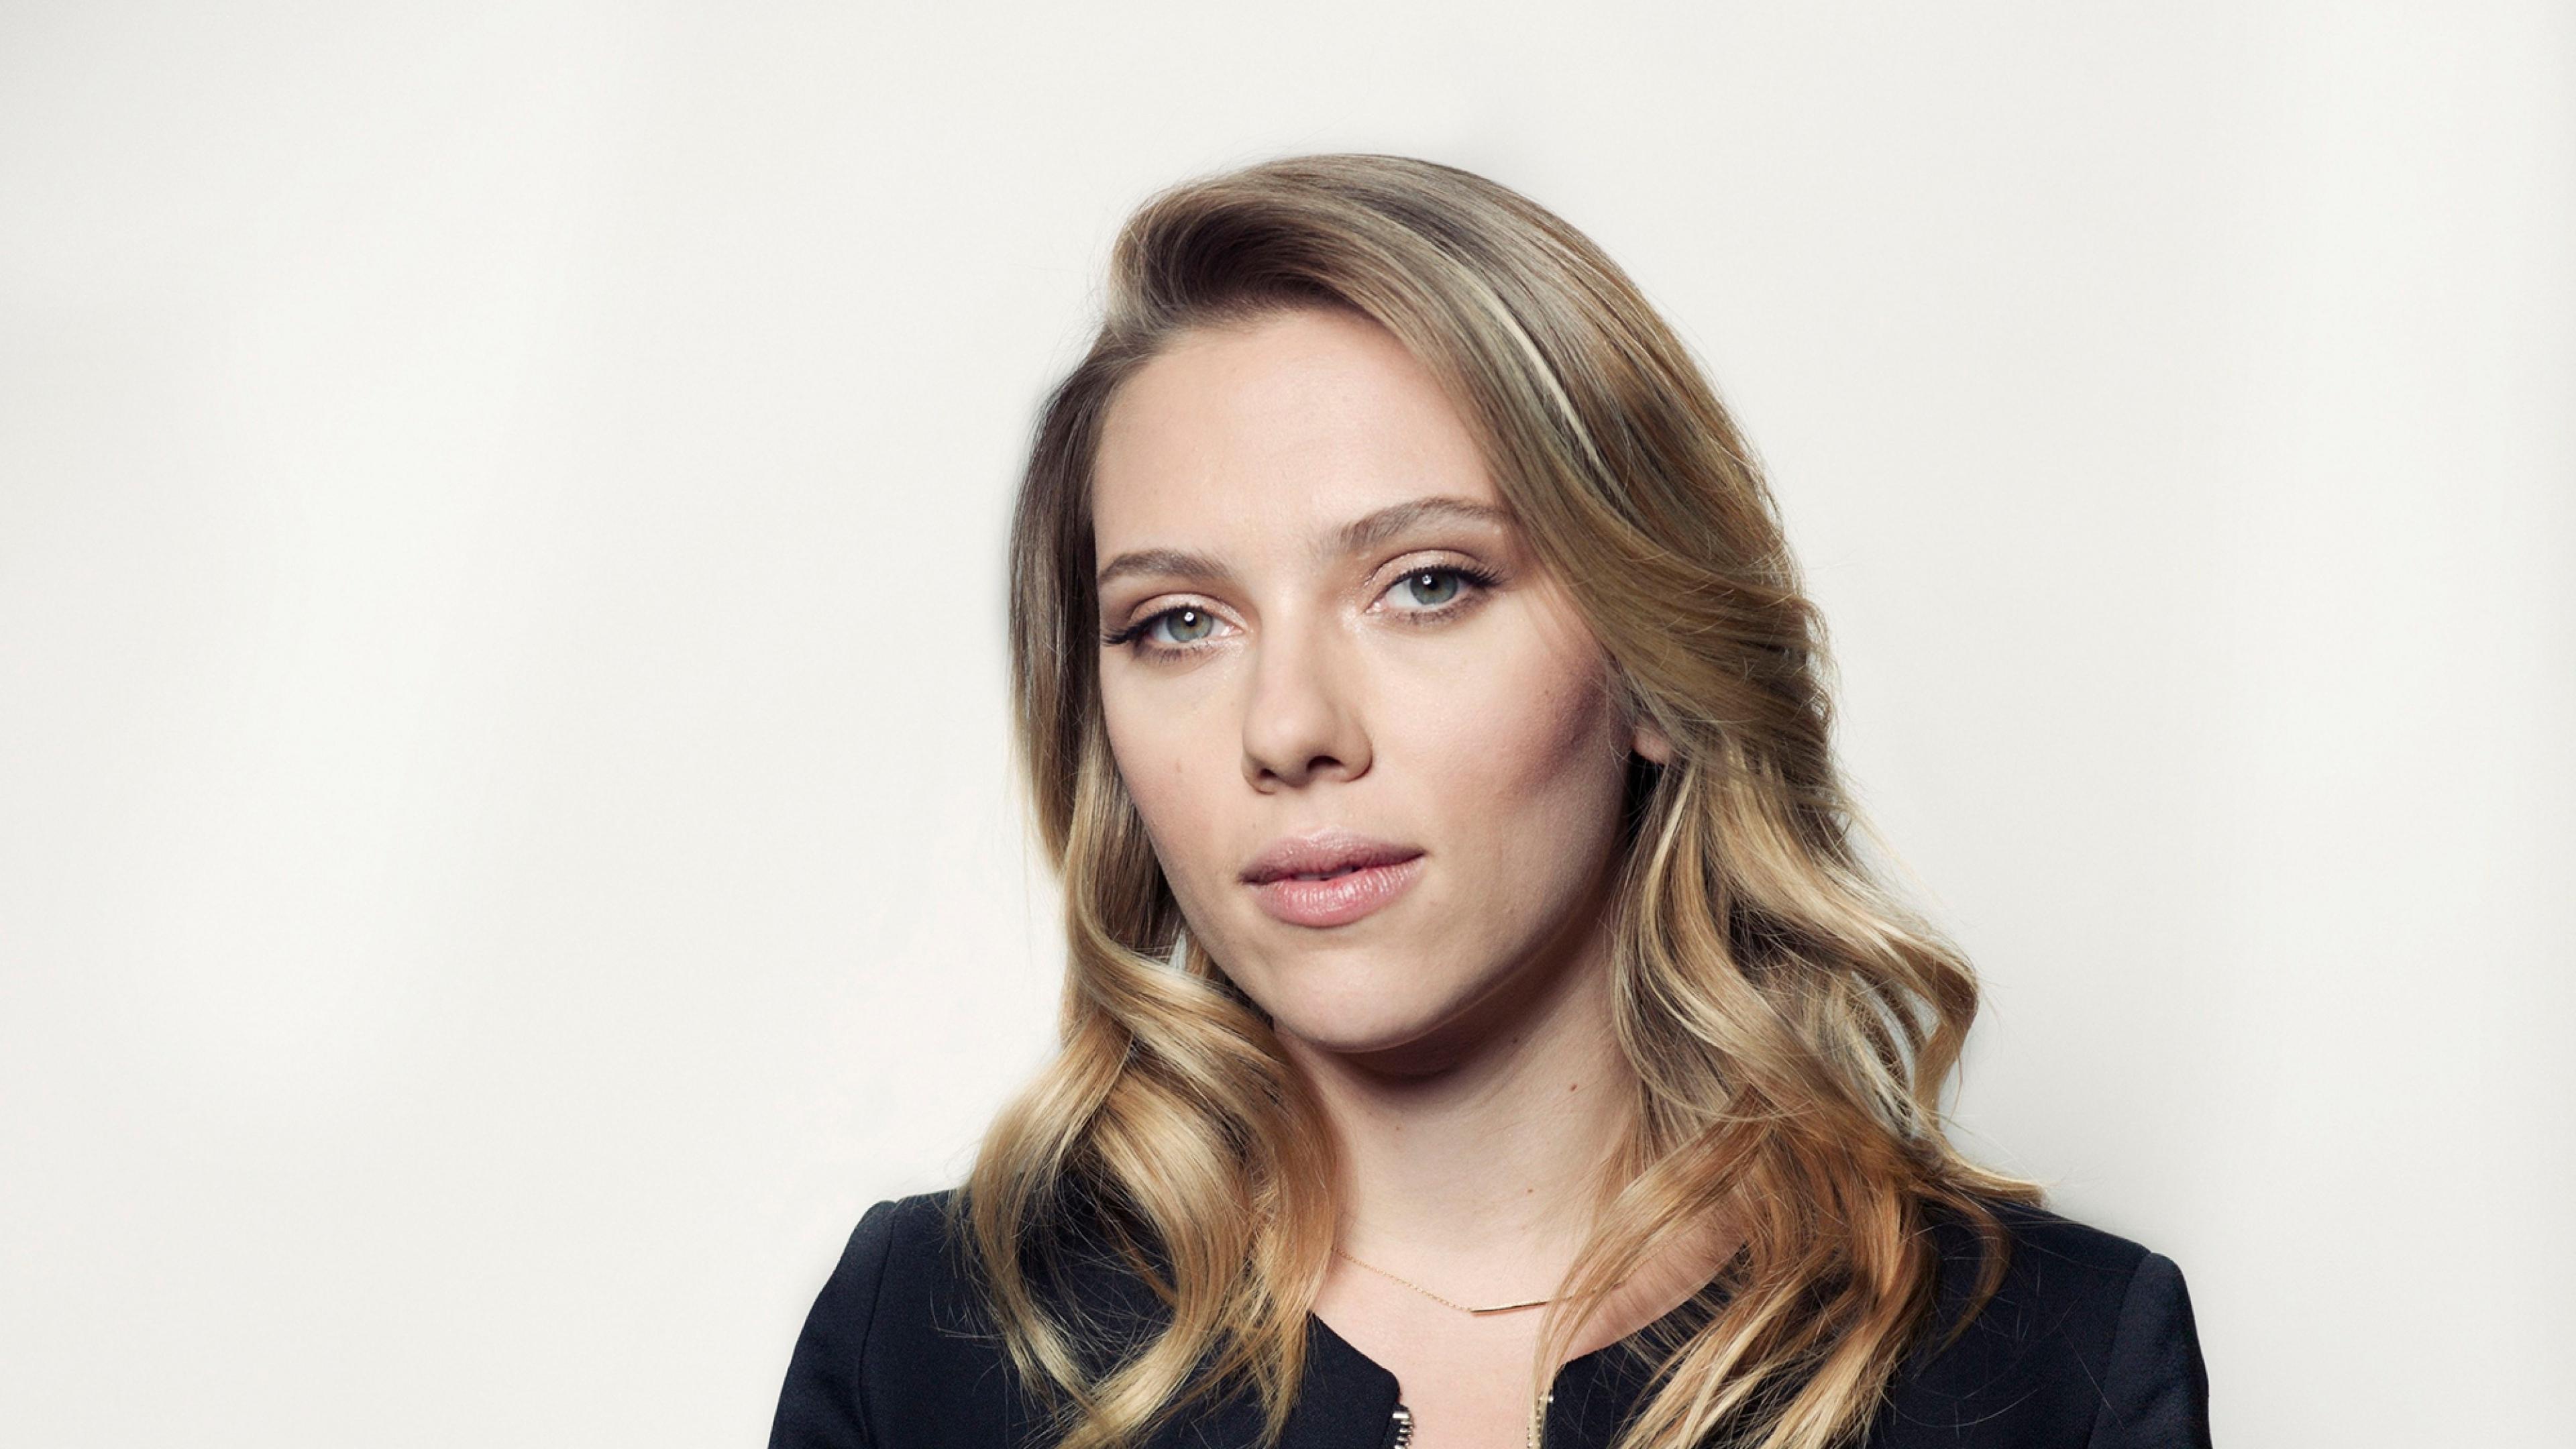 27 Gorgeous HD Scarlett Johansson Wallpapers